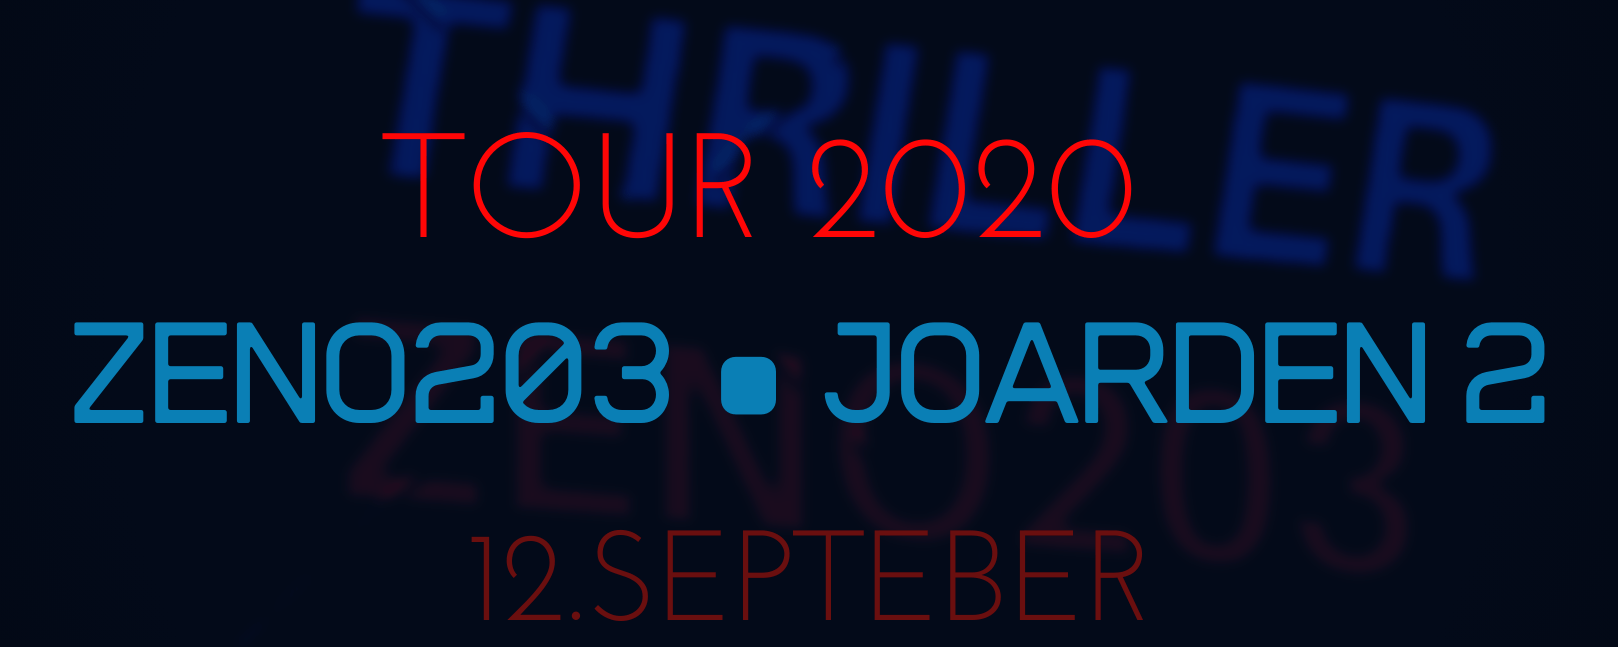 ZENO203 • JOARDEN 2 Konzert